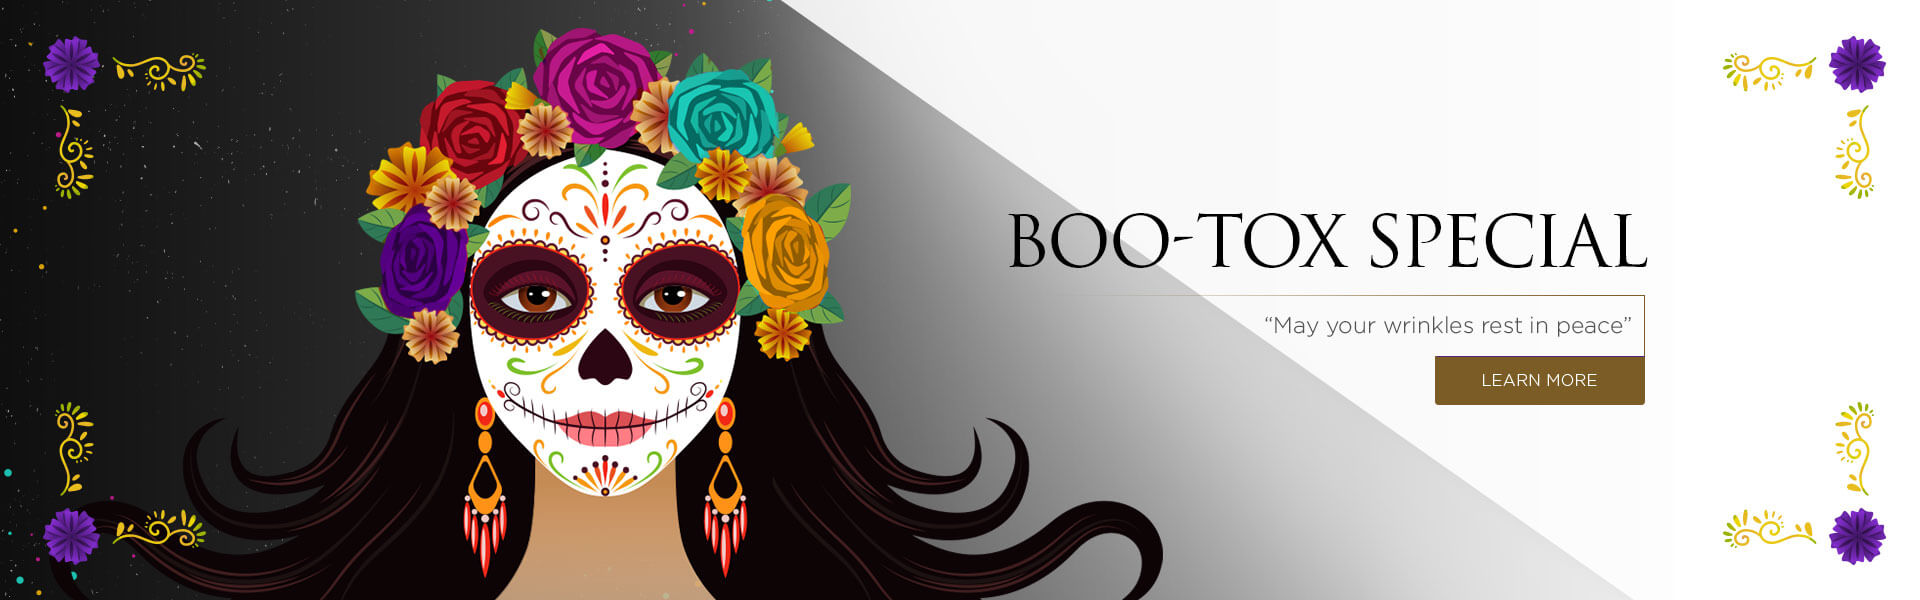 boo-tox-specials-slider